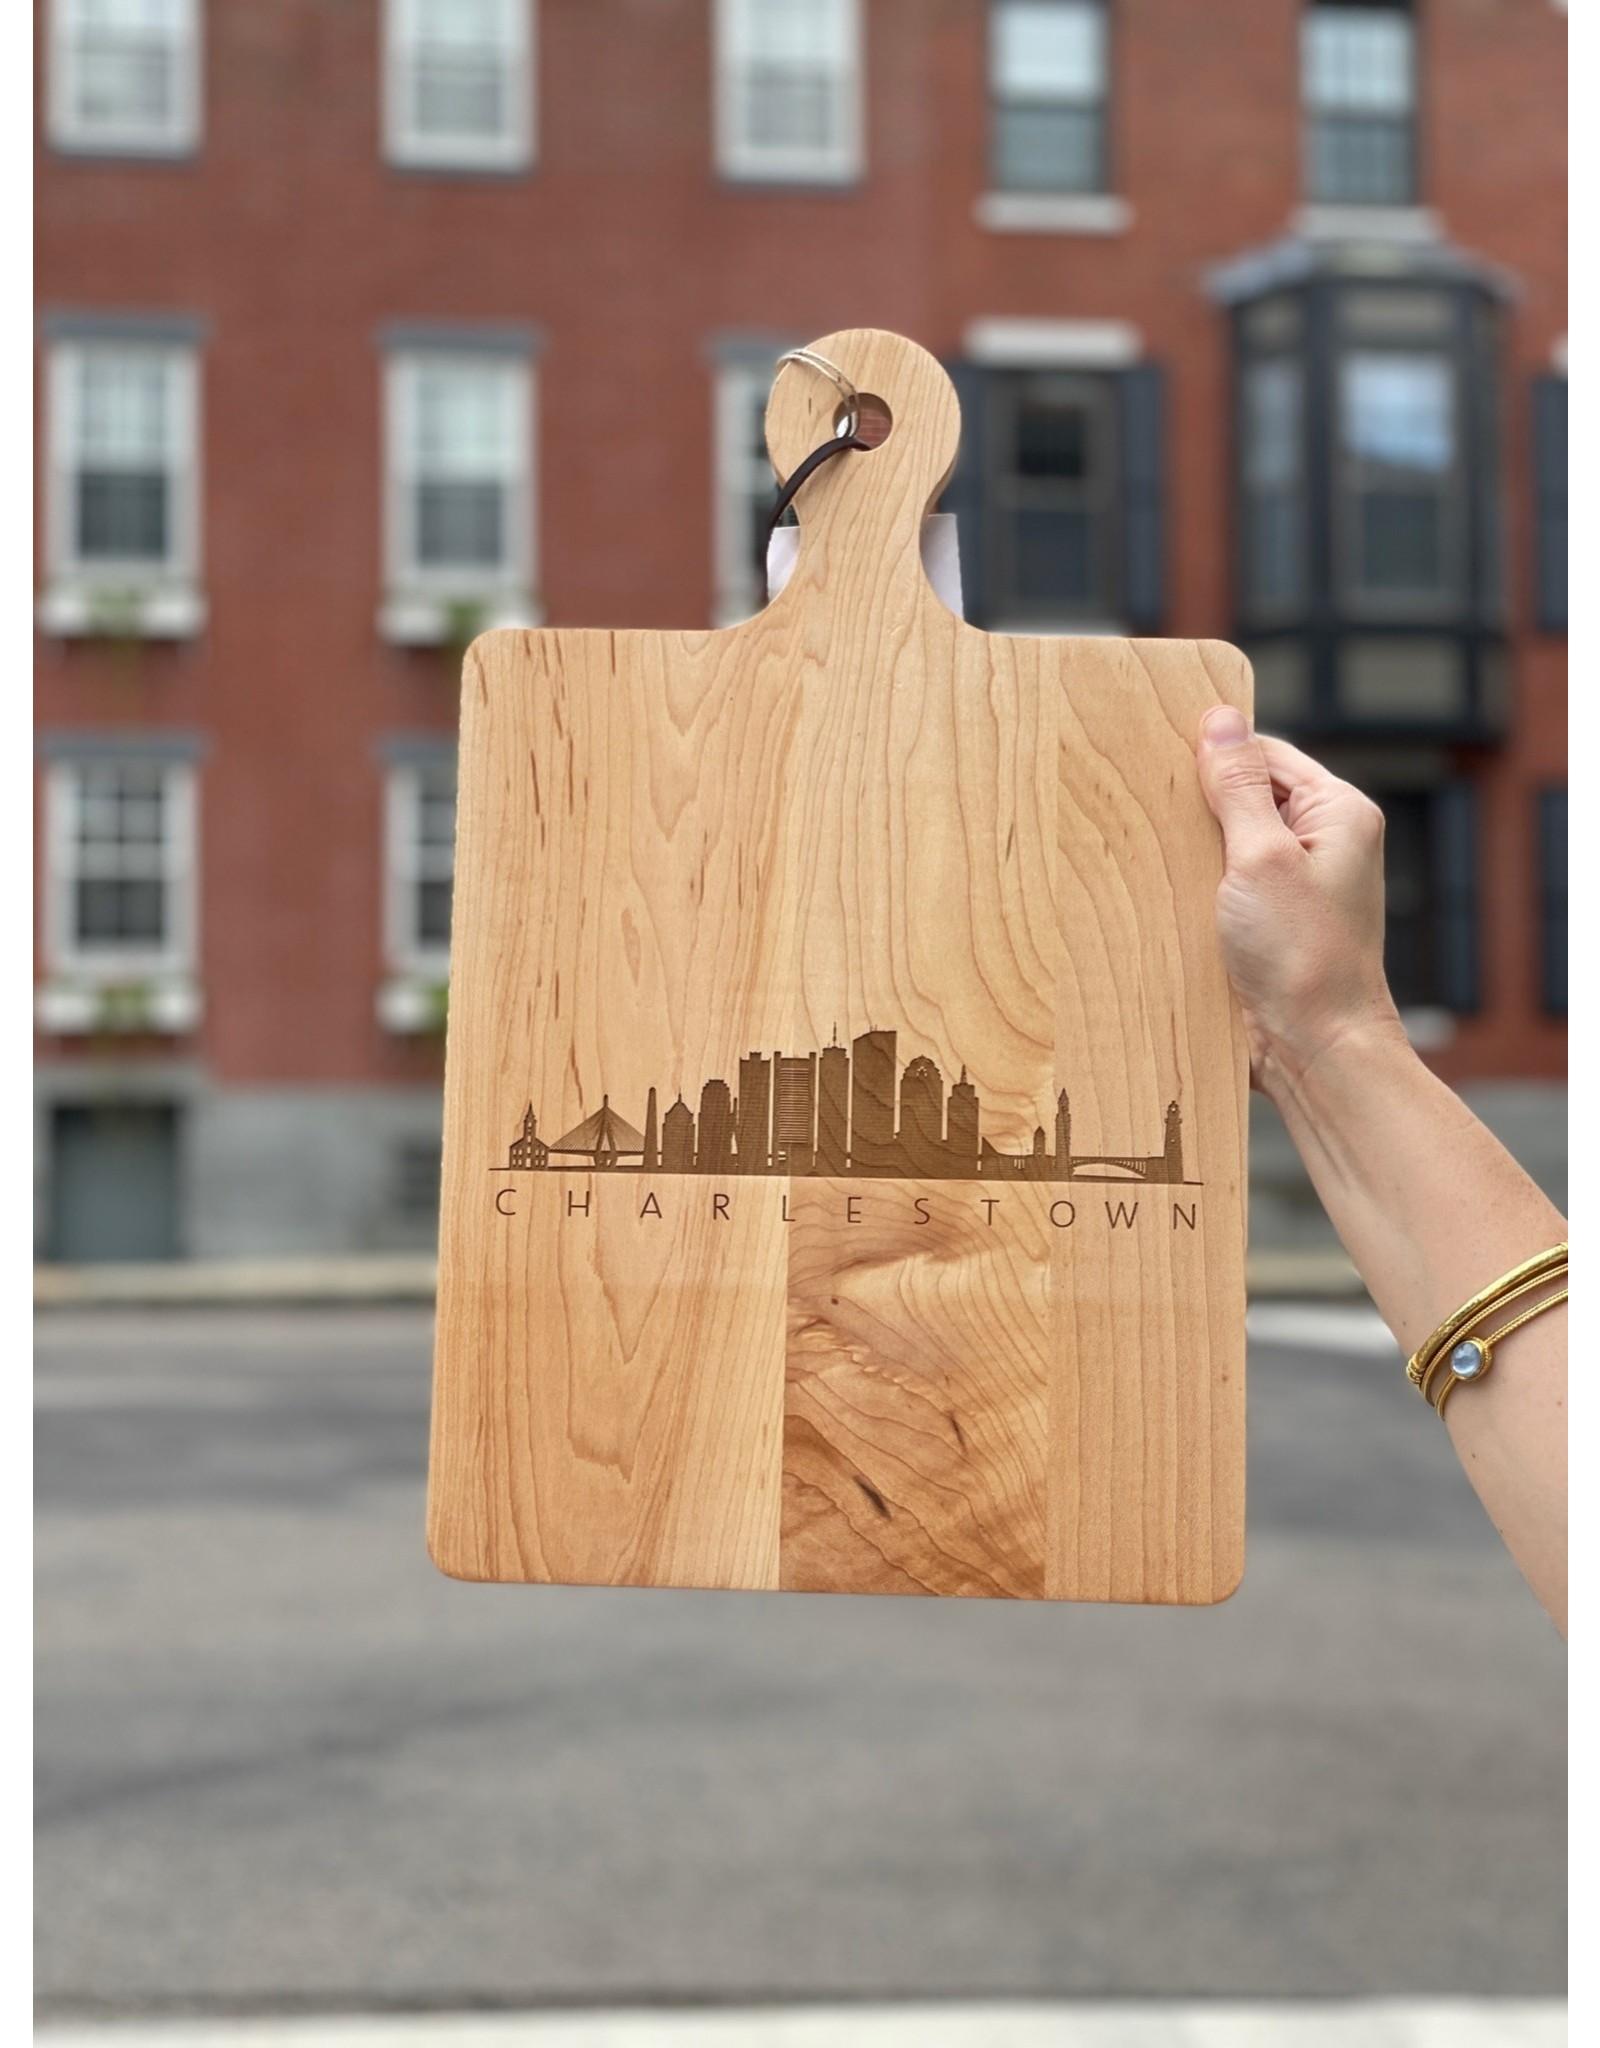 Maple Leaf at Home Skyline Handled Maple Artisan Board 16x10